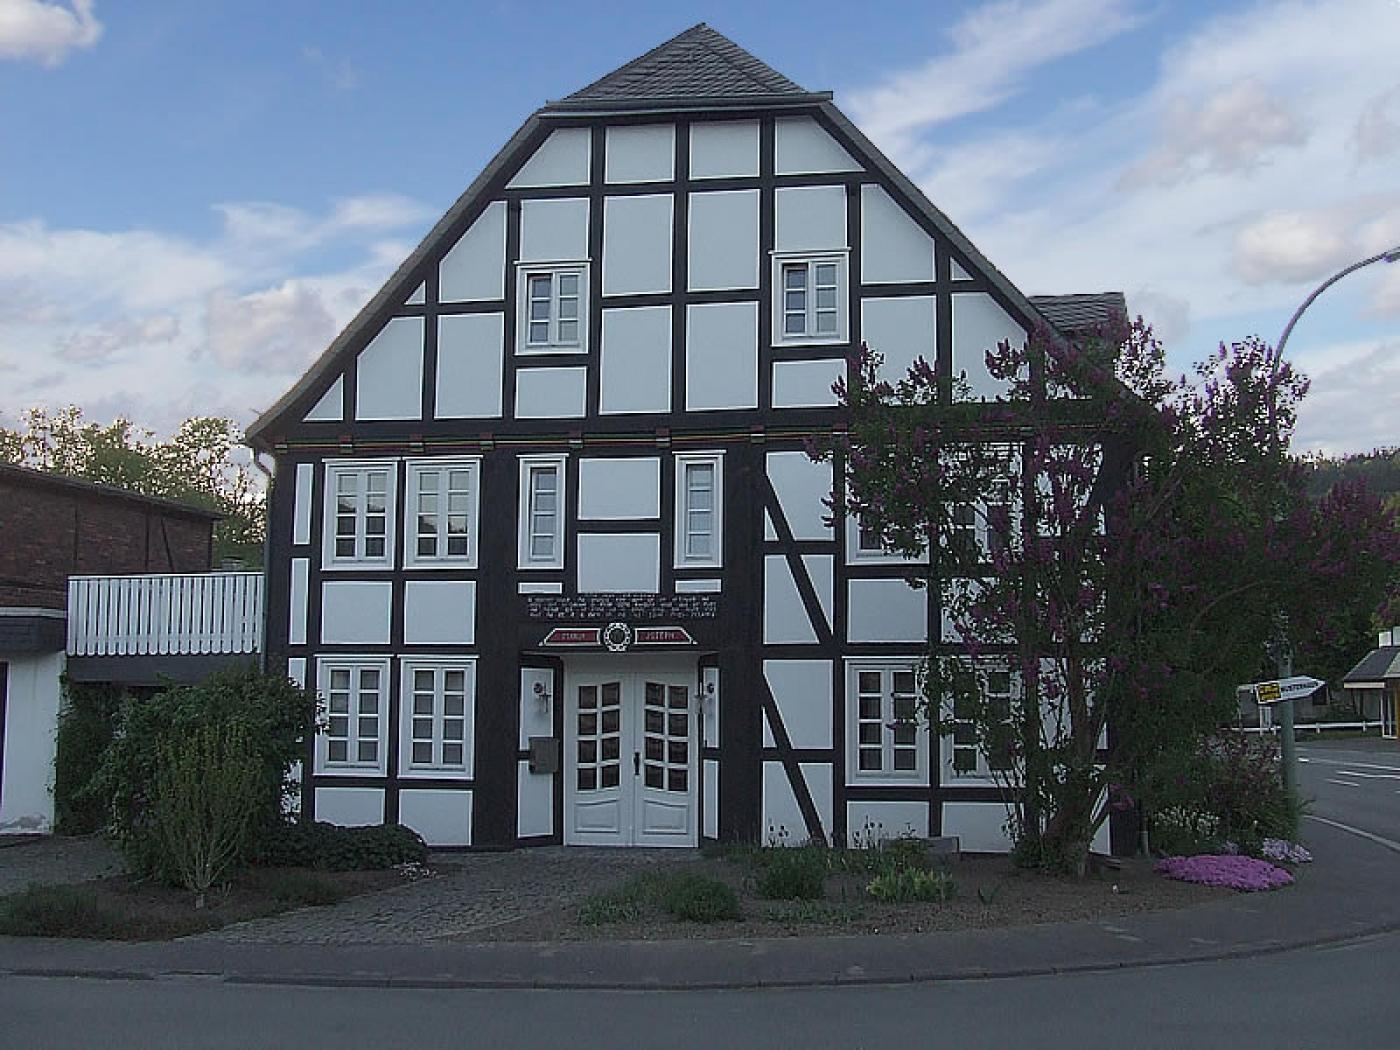 Fachwerkhaus in Ostwig (Bestwig)